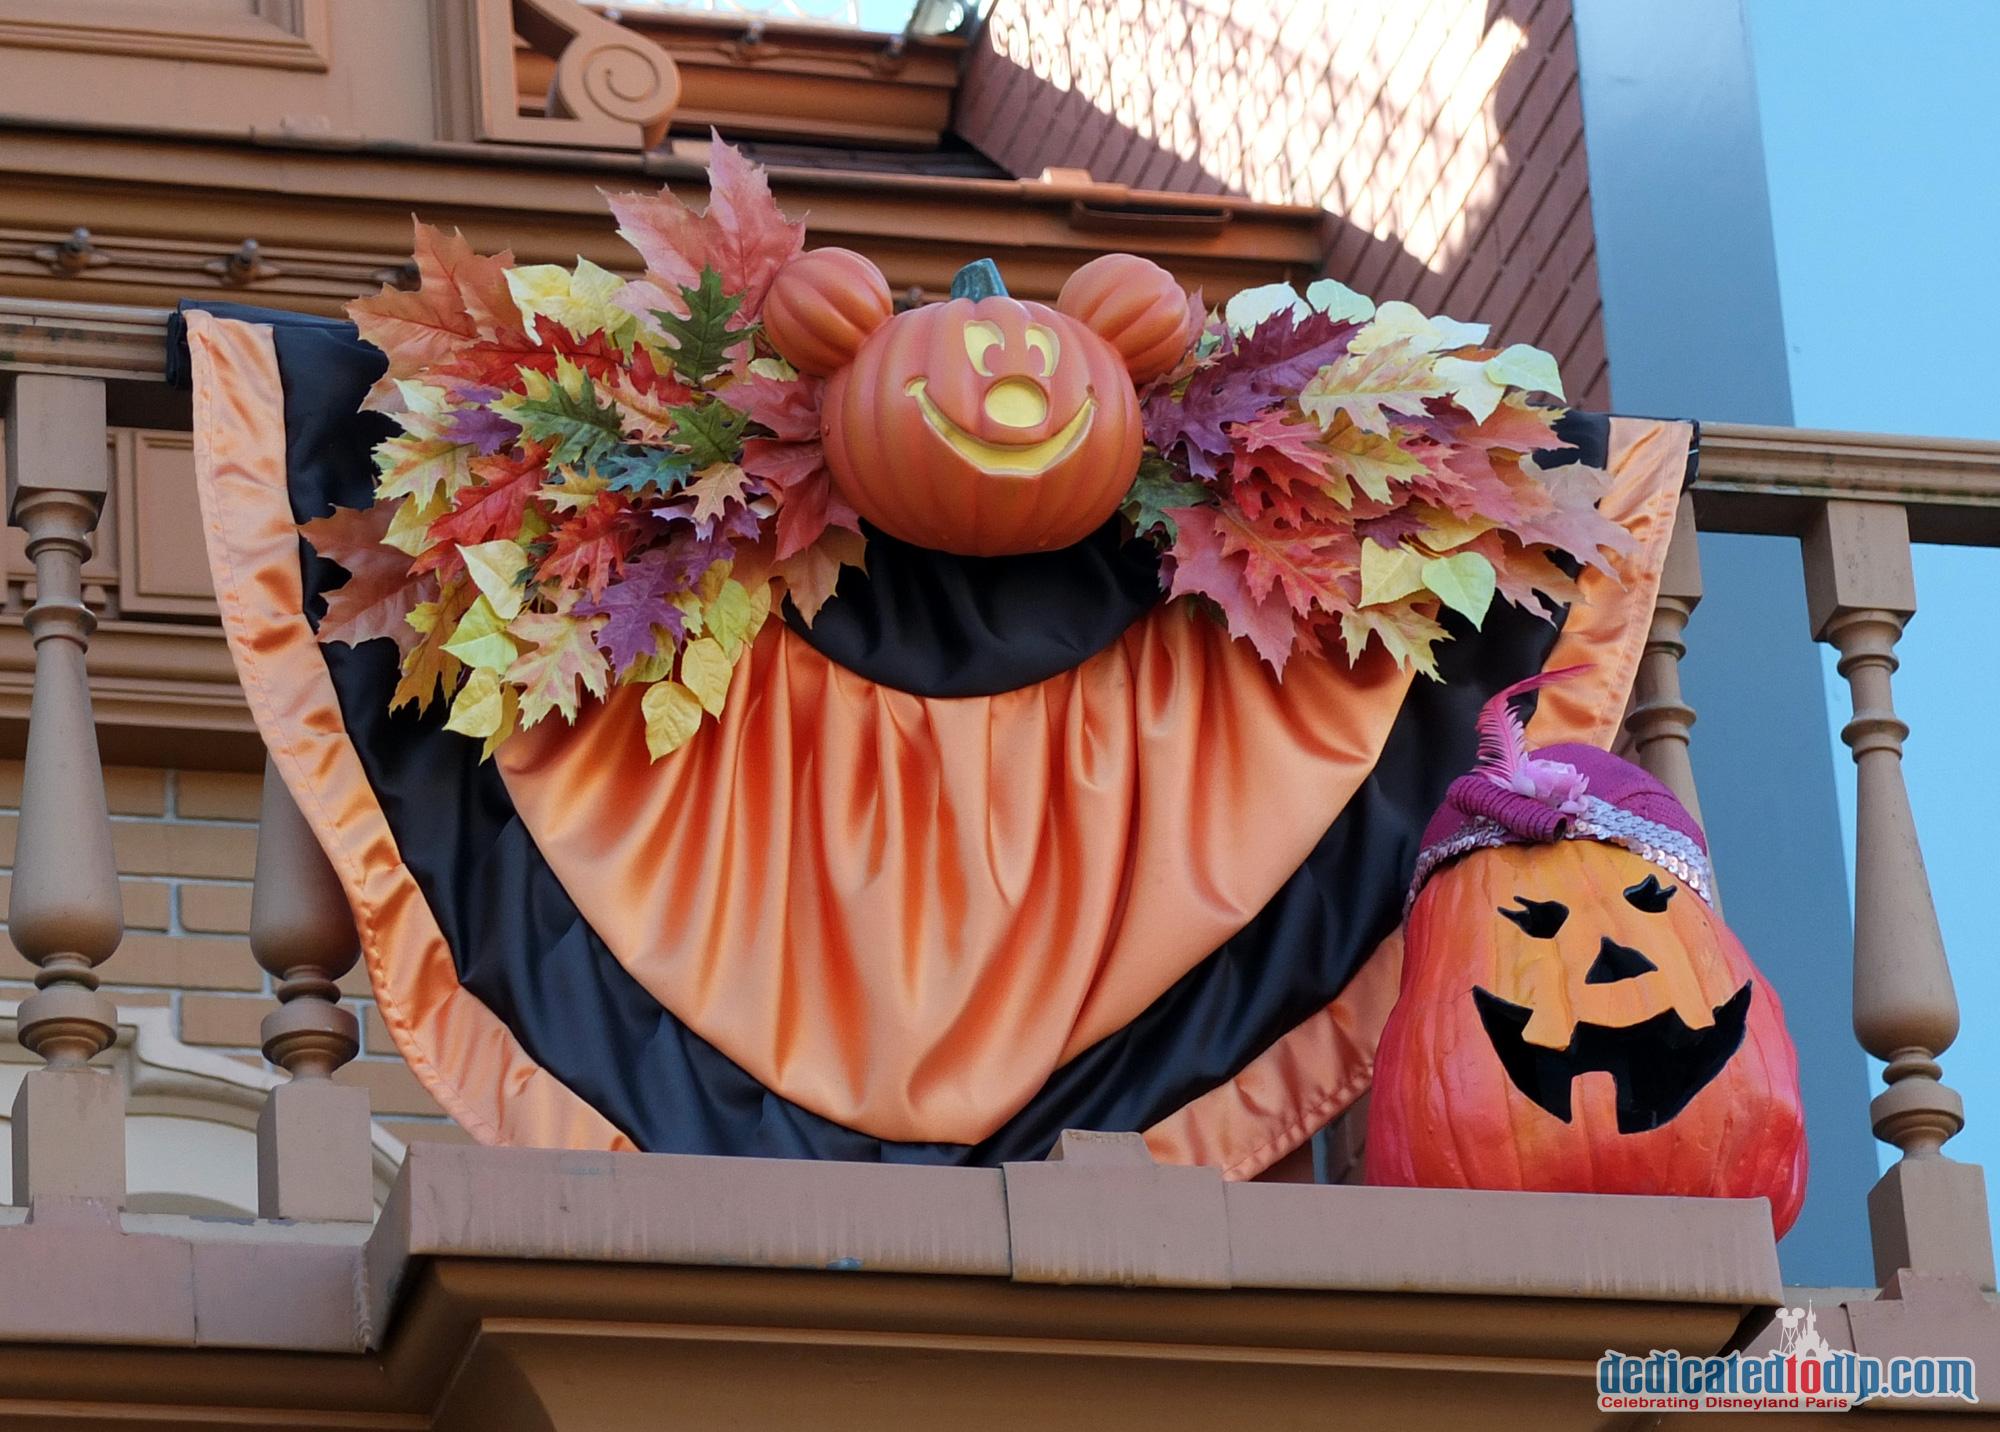 disneyland paris halloween 2016 decorations - When Does Disneyland Decorate For Halloween